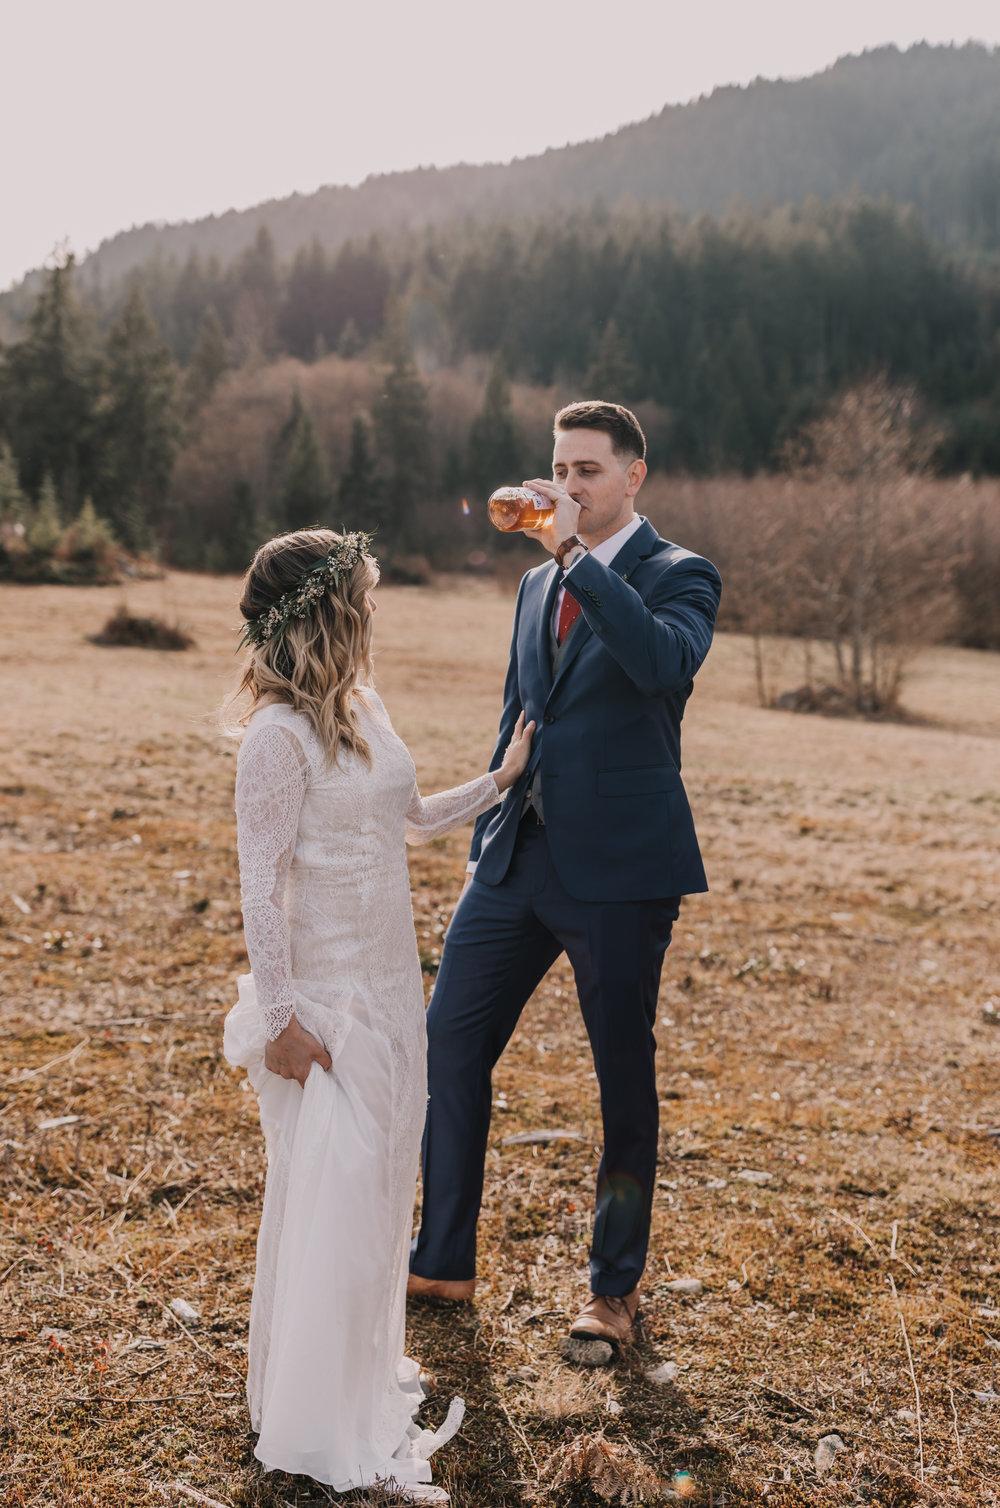 Sunshine Coast Wedding Photos - Mountain Wedding Photos - Sunshine Coast Wedding Photographer - Vancouver Wedding Photographer - Jennifer Picard263-1.JPG